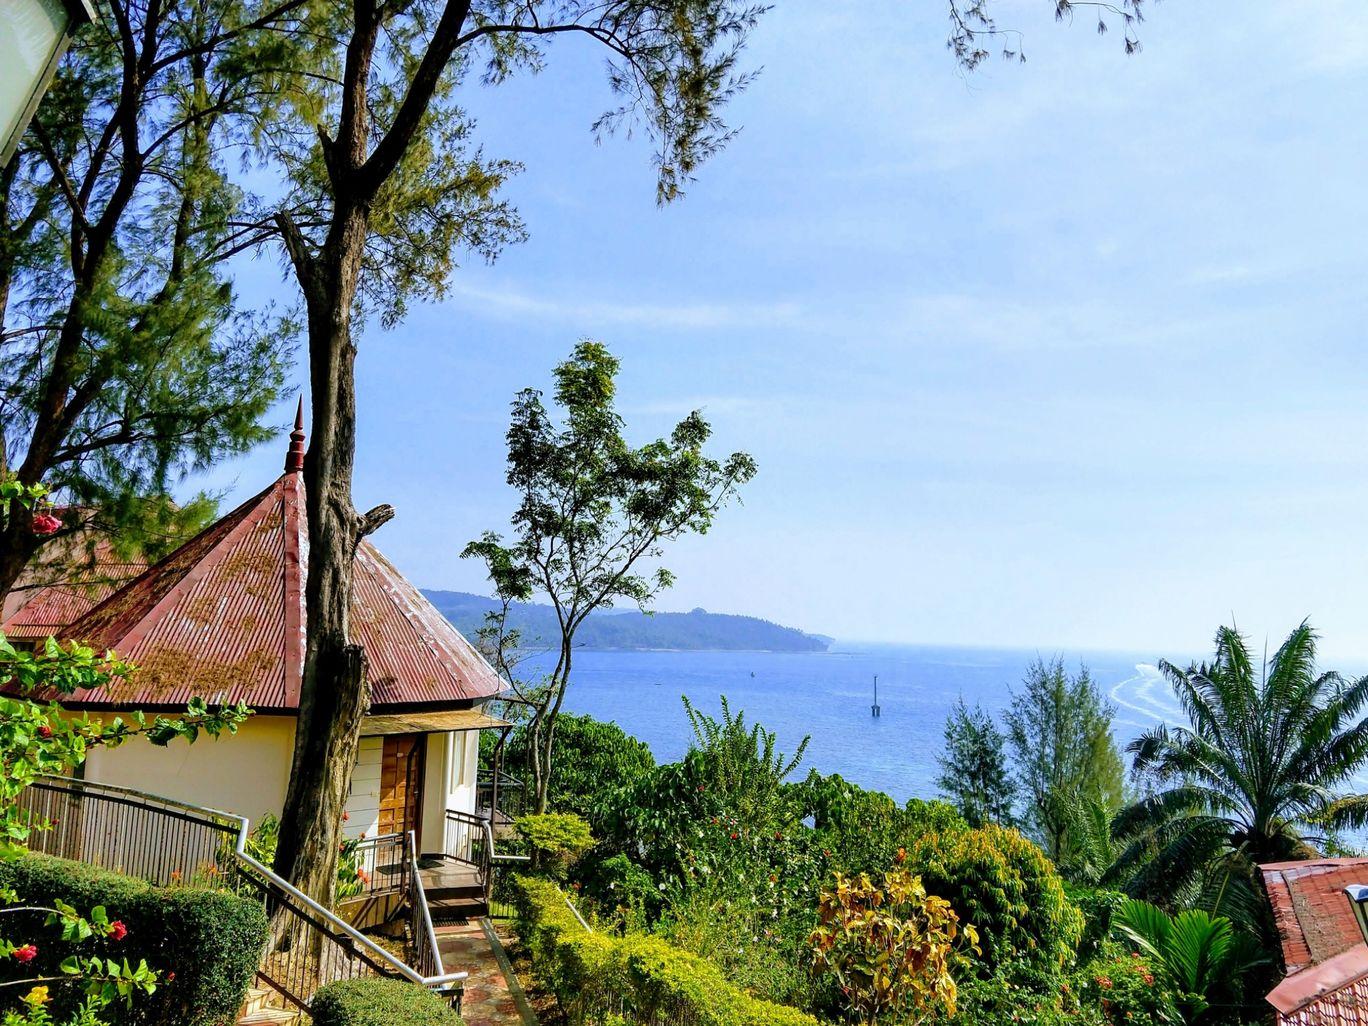 Photo of Megapode Resort By tulika pandey